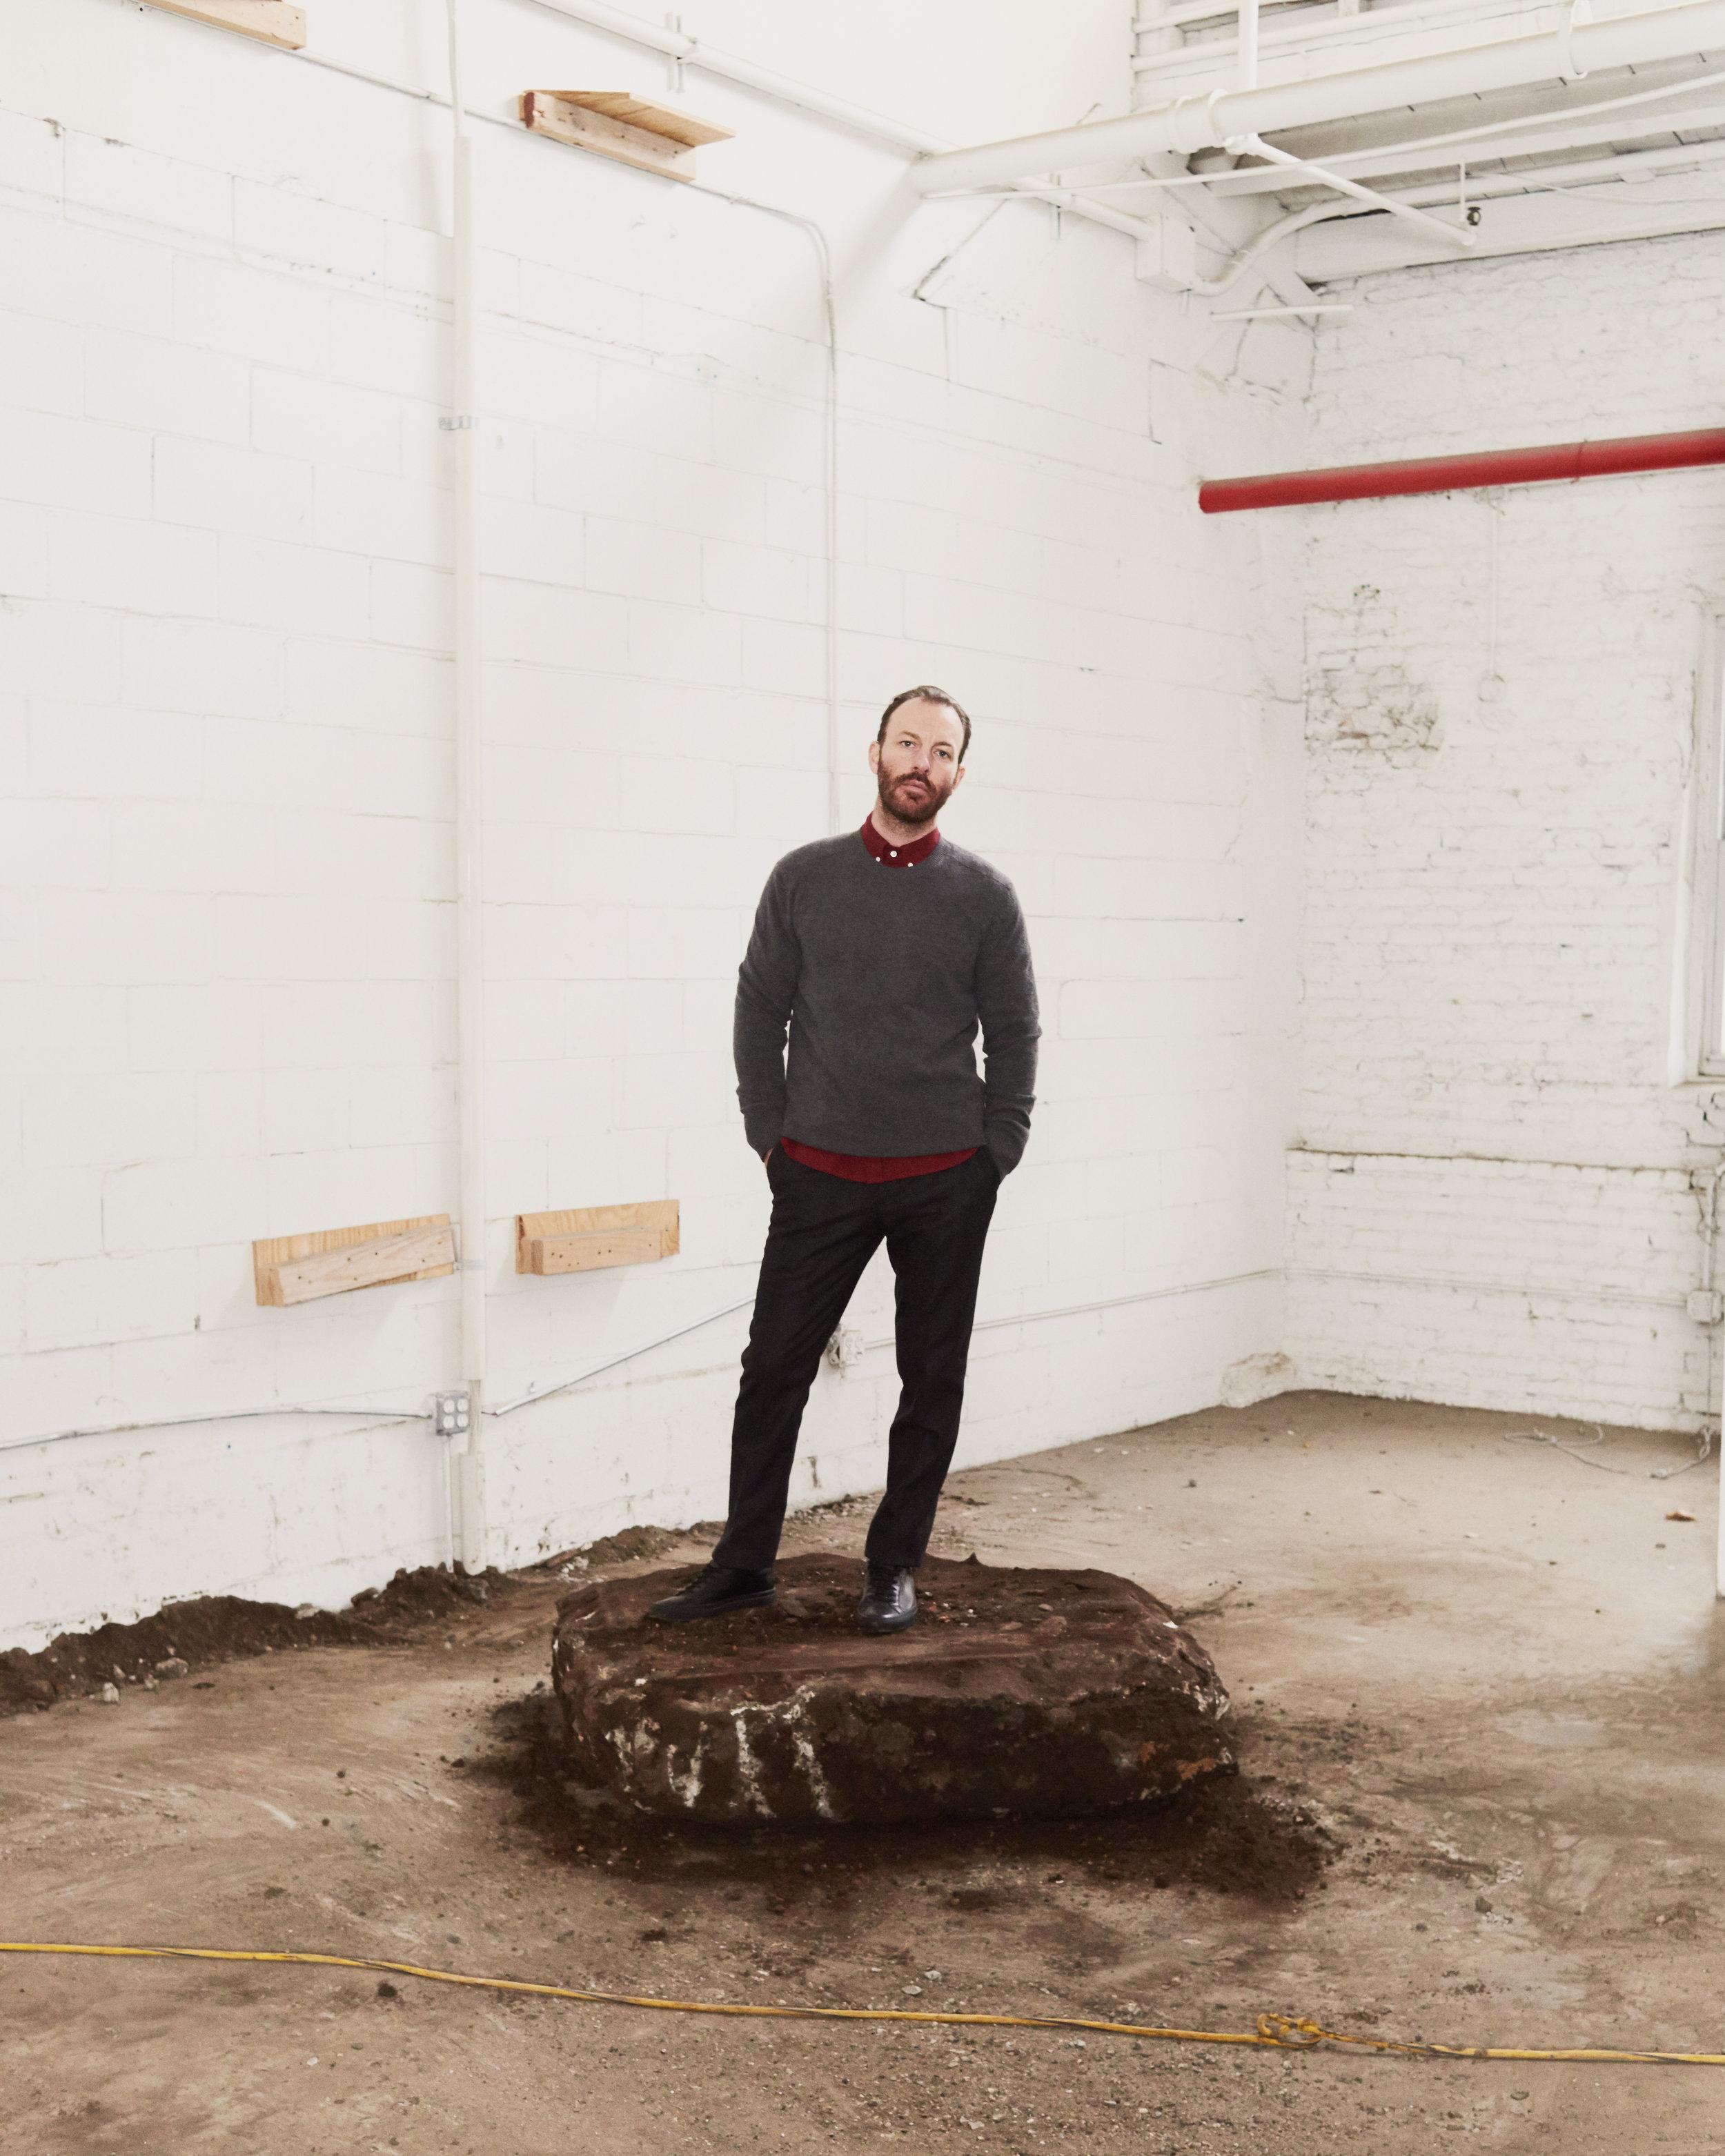 Steven Alan Light Seamless Sweater  +  Classic Collegiate Shirt  +  Draft Pant  +  Common Projects Original Achilles